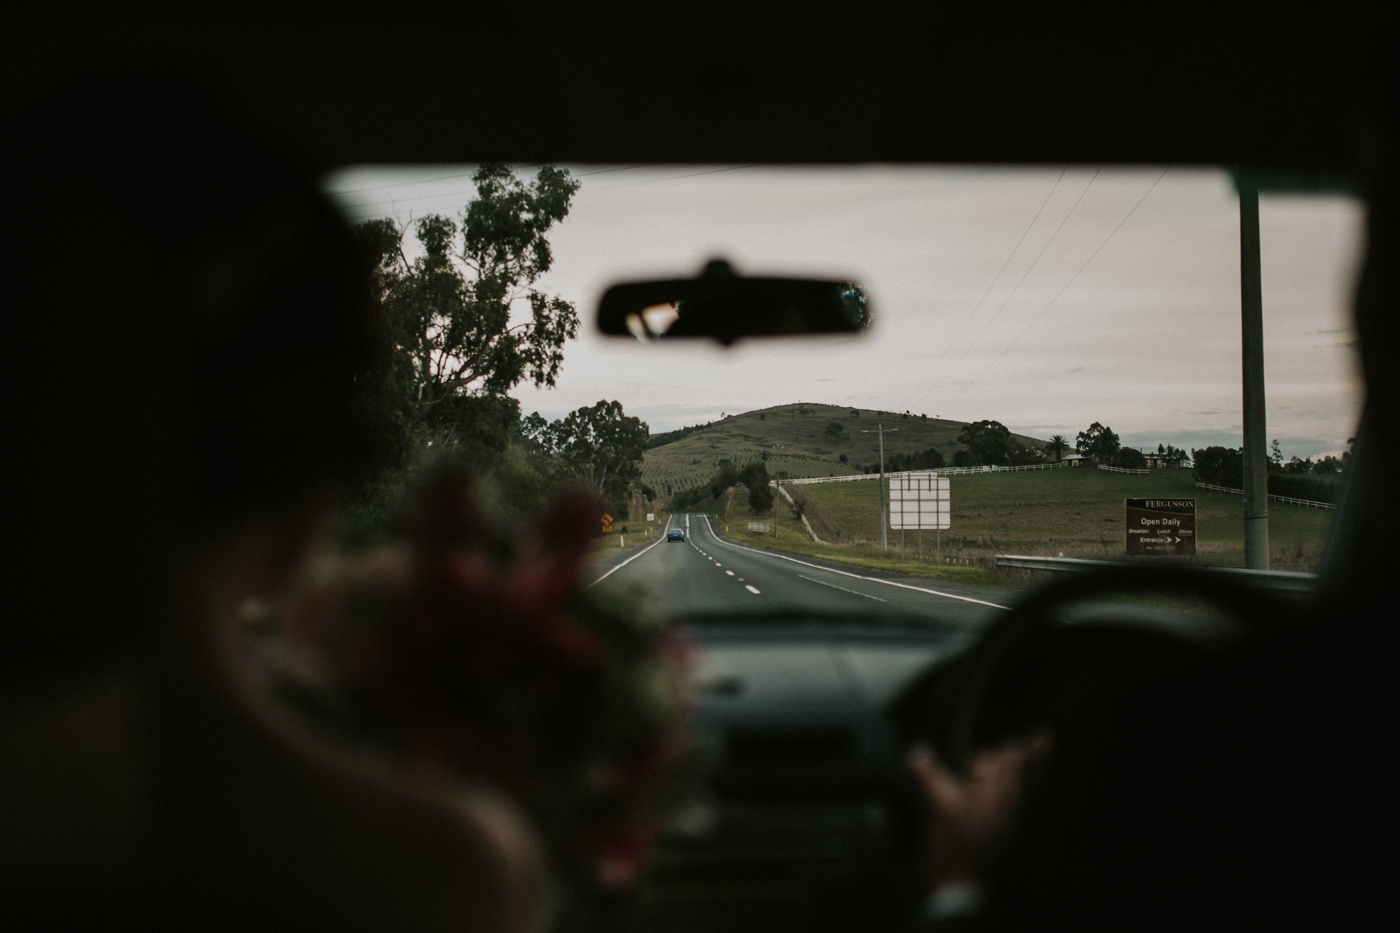 Emma&Morgan_Melbourne-Vintage-Elegant-Fun-Quirky-Yarra-Valley-Vineyard-Wedding_Melbourne-Wedding-Photography-62